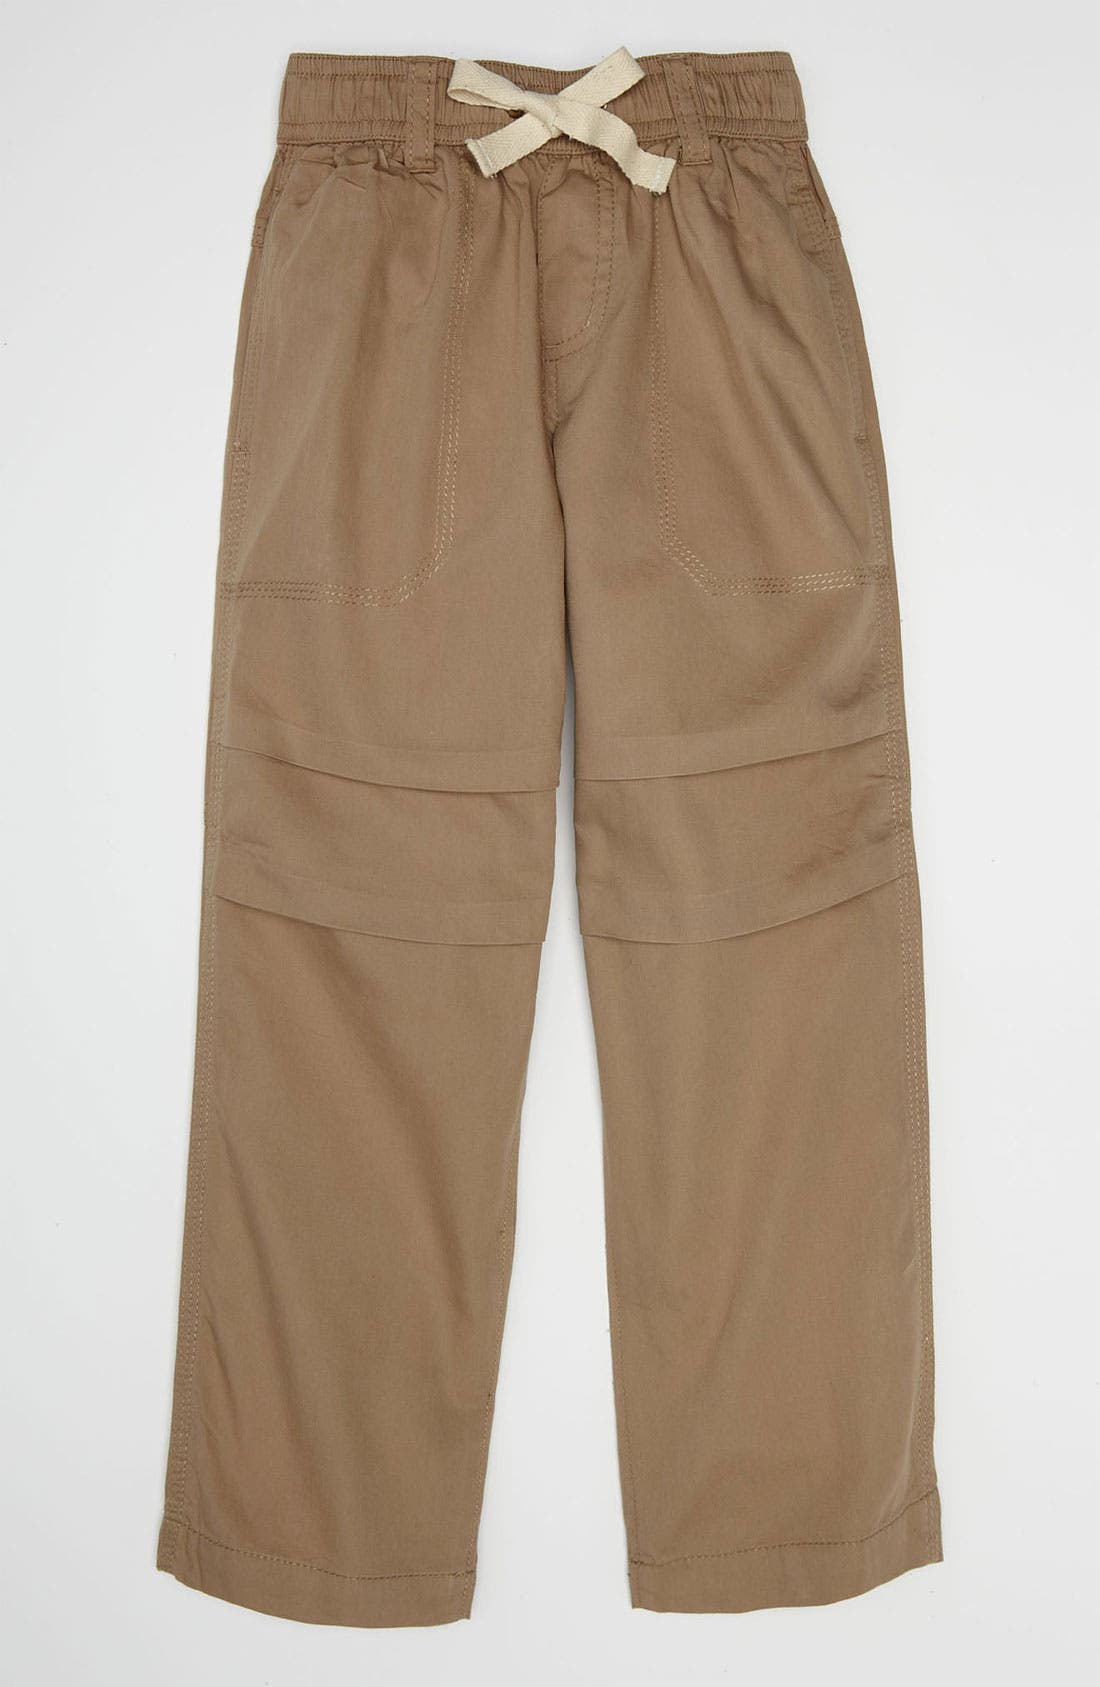 Main Image - Peek 'Everyday' Pants (Big Boys)